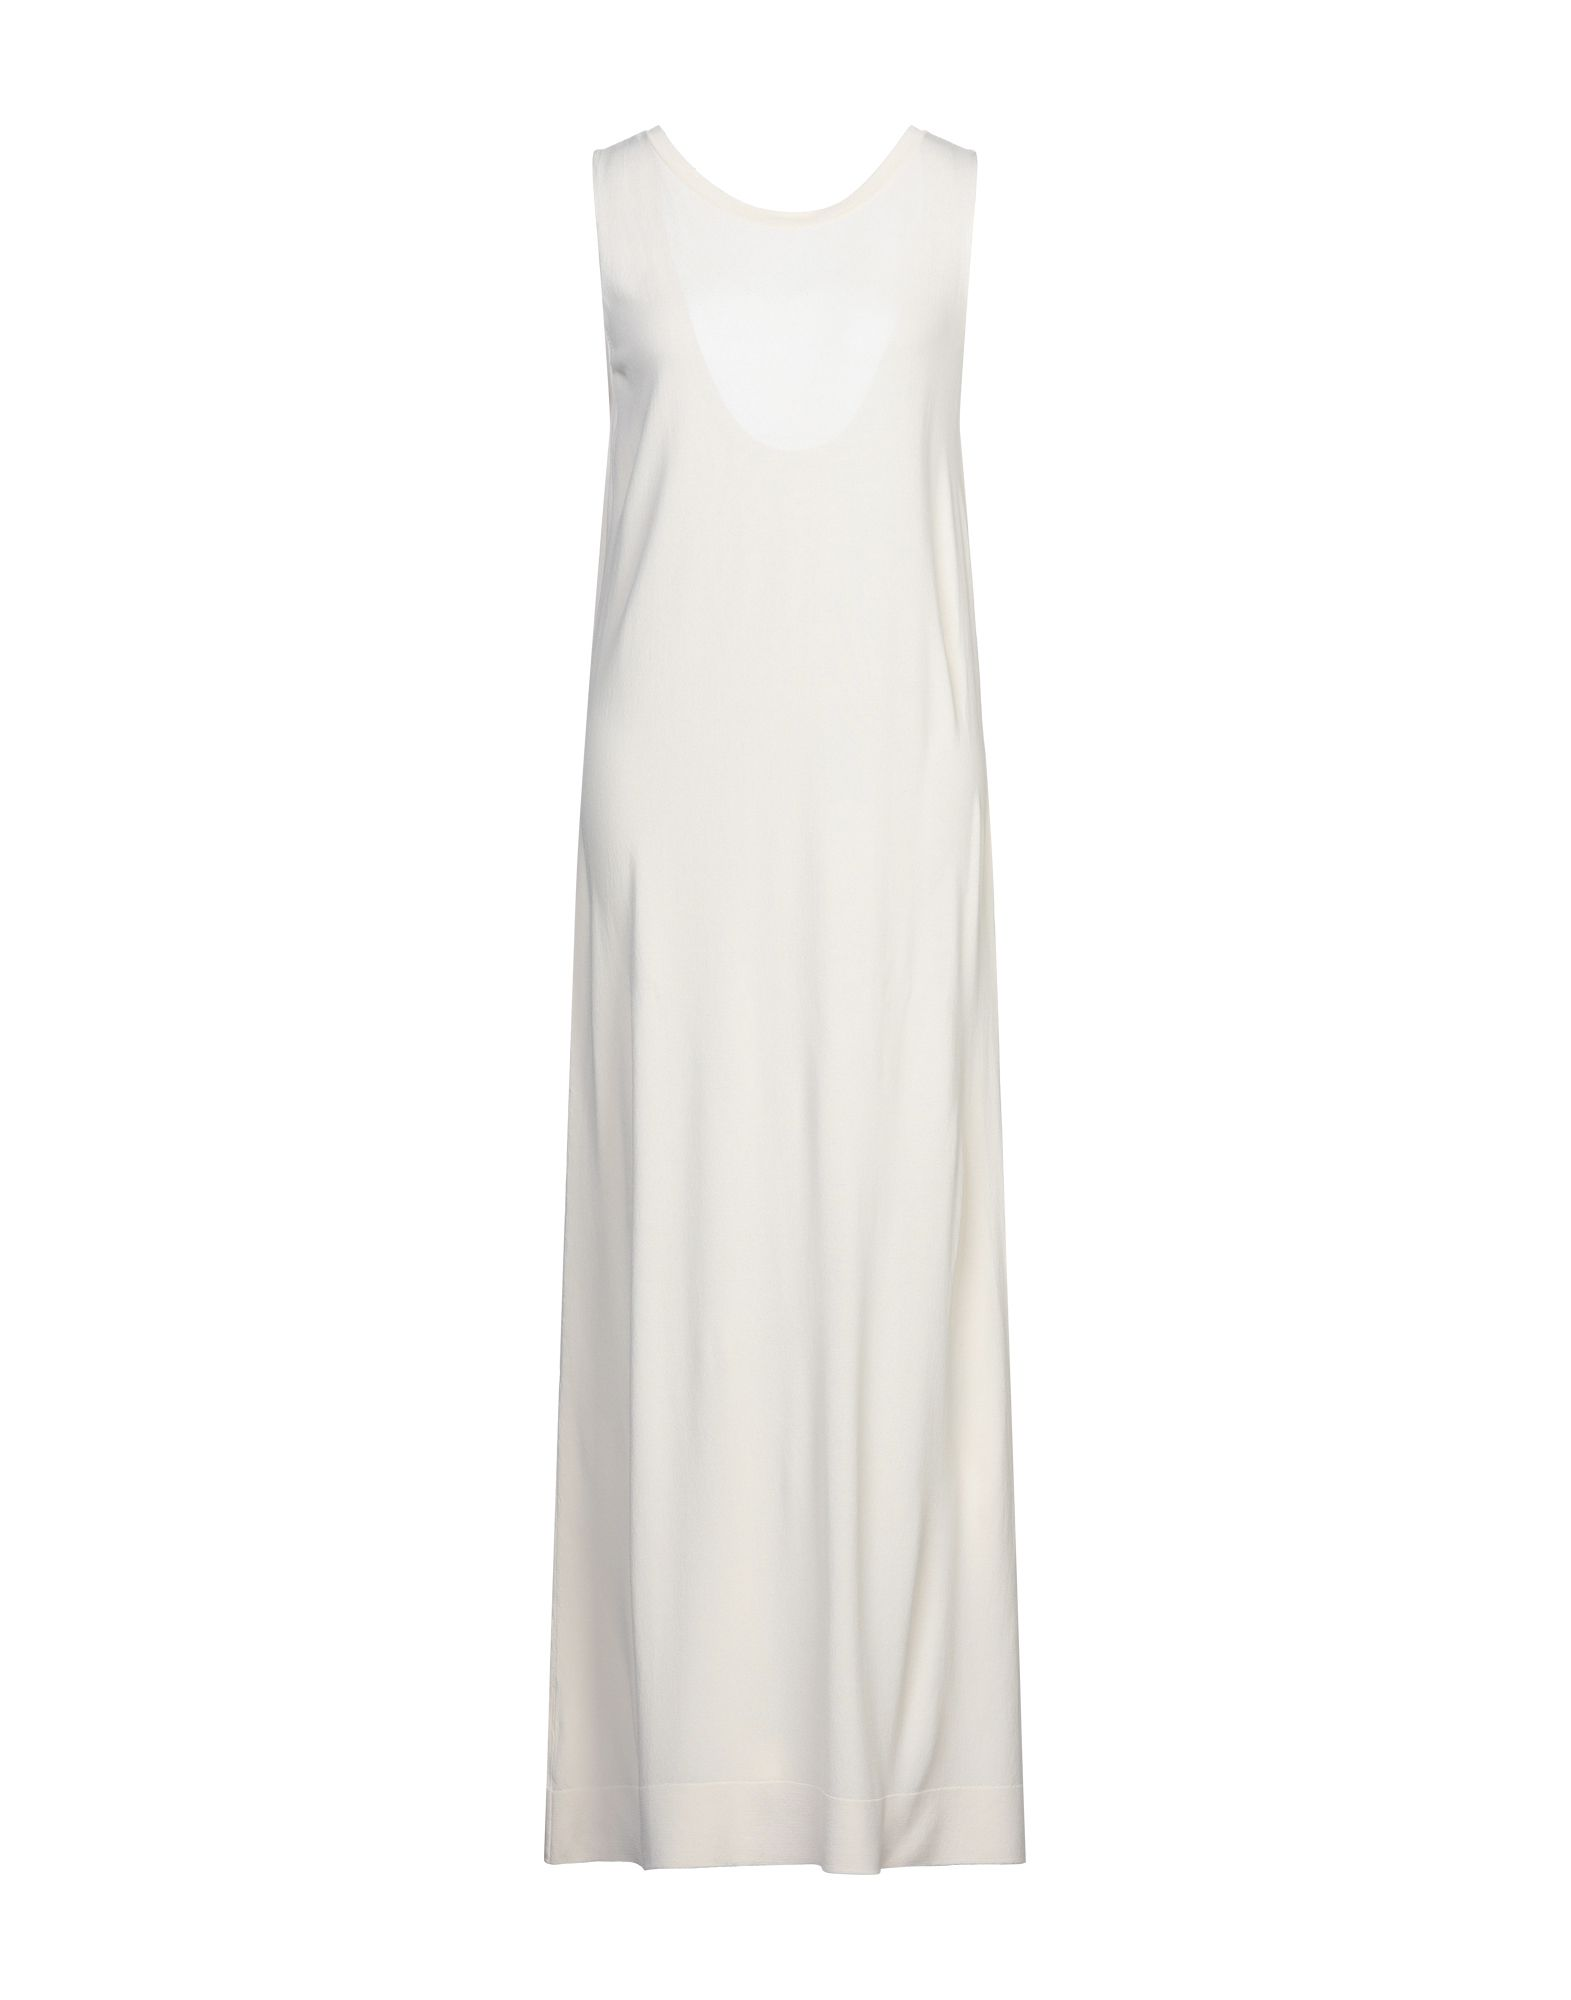 Фото - LIVIANA CONTI Длинное платье ferrante длинное платье